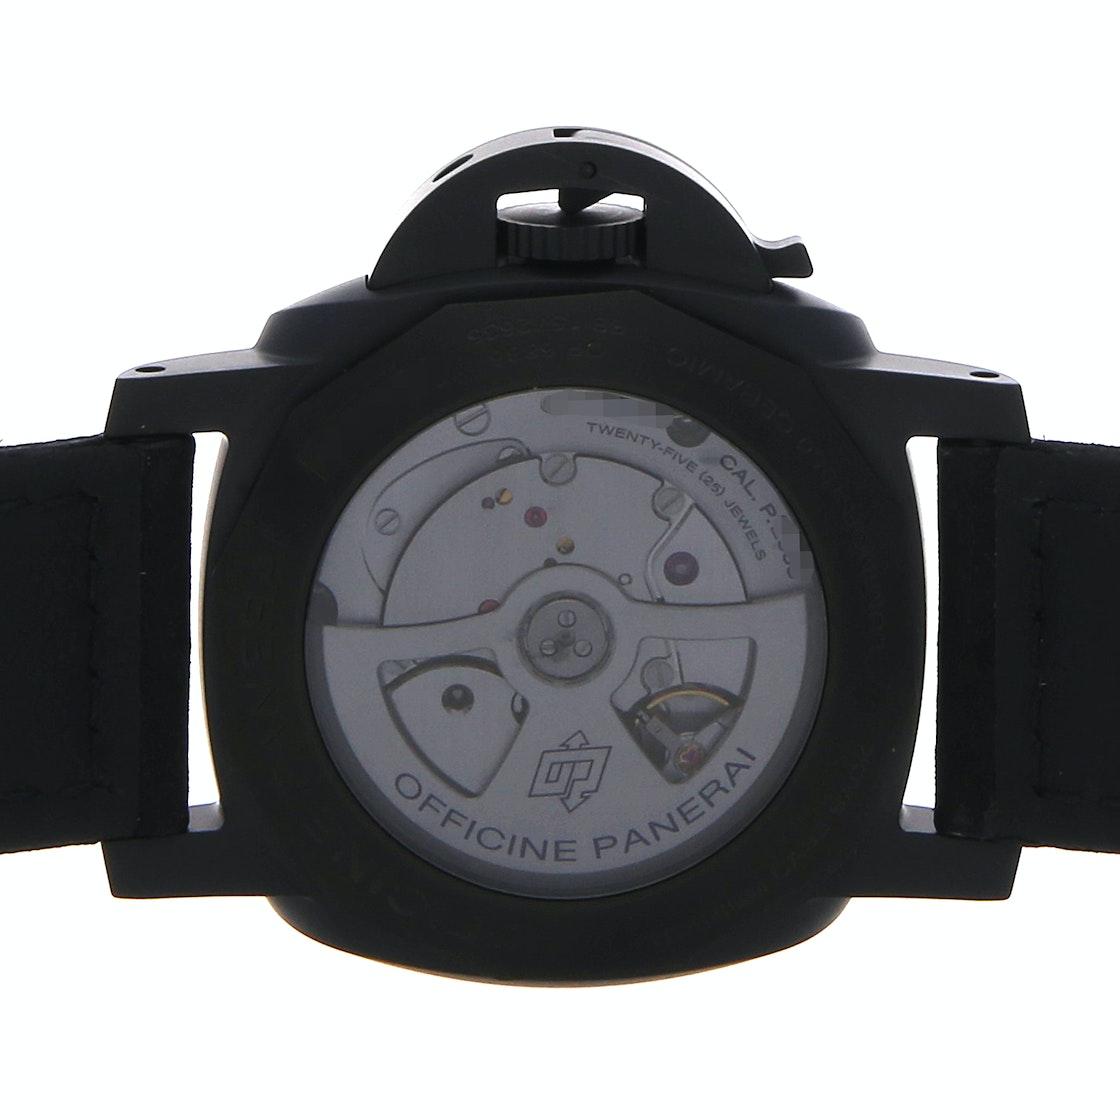 Panerai Luminor 1950 10-Days GMT Ceramica PAM 335